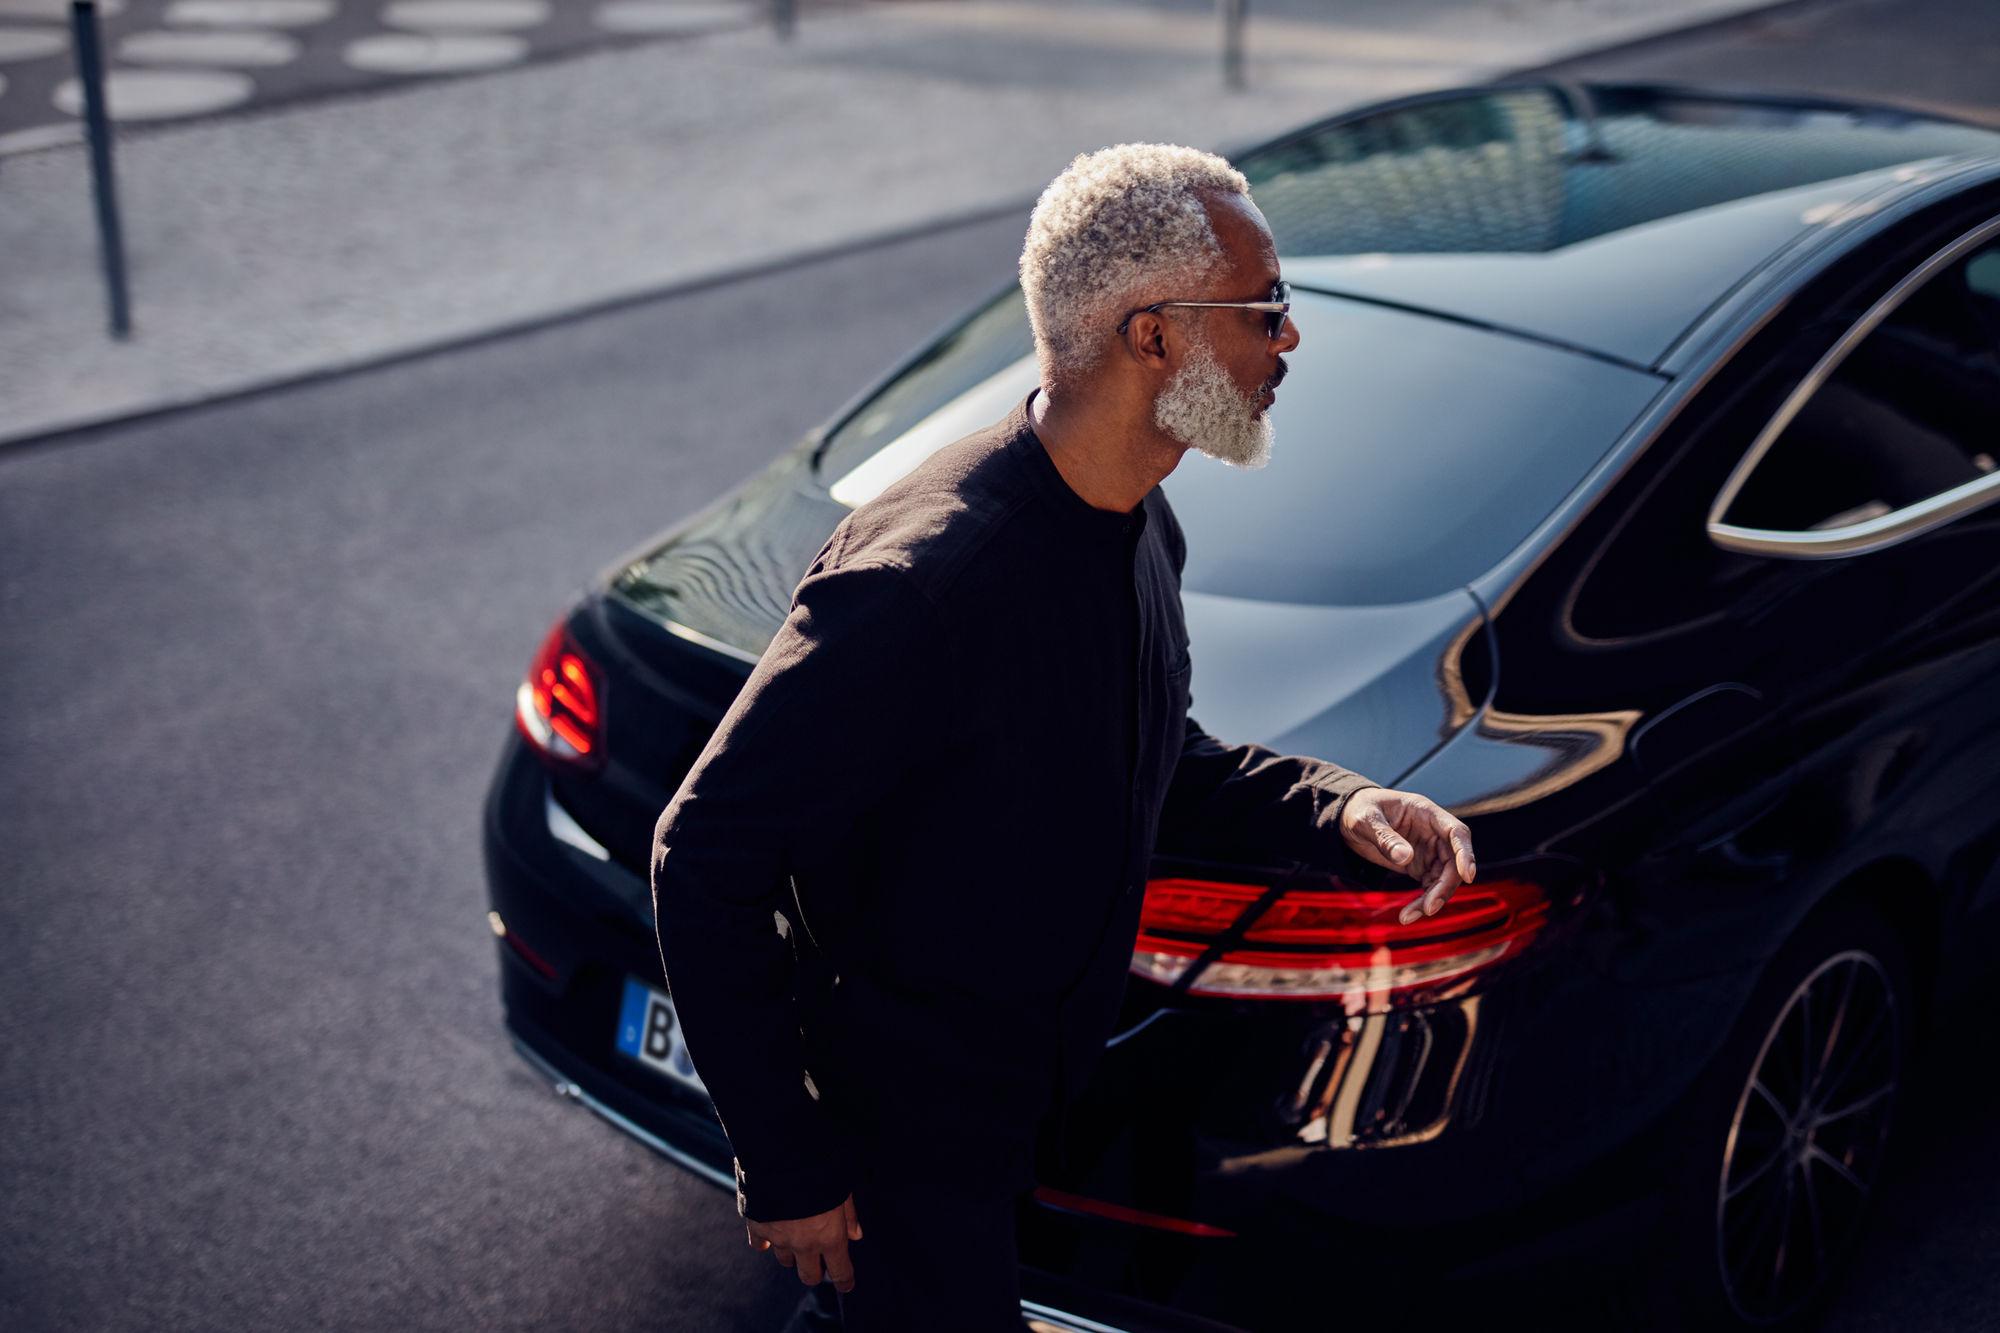 EMEIS DEUBEL: Özgür Albayrak for Daimler Financial Services